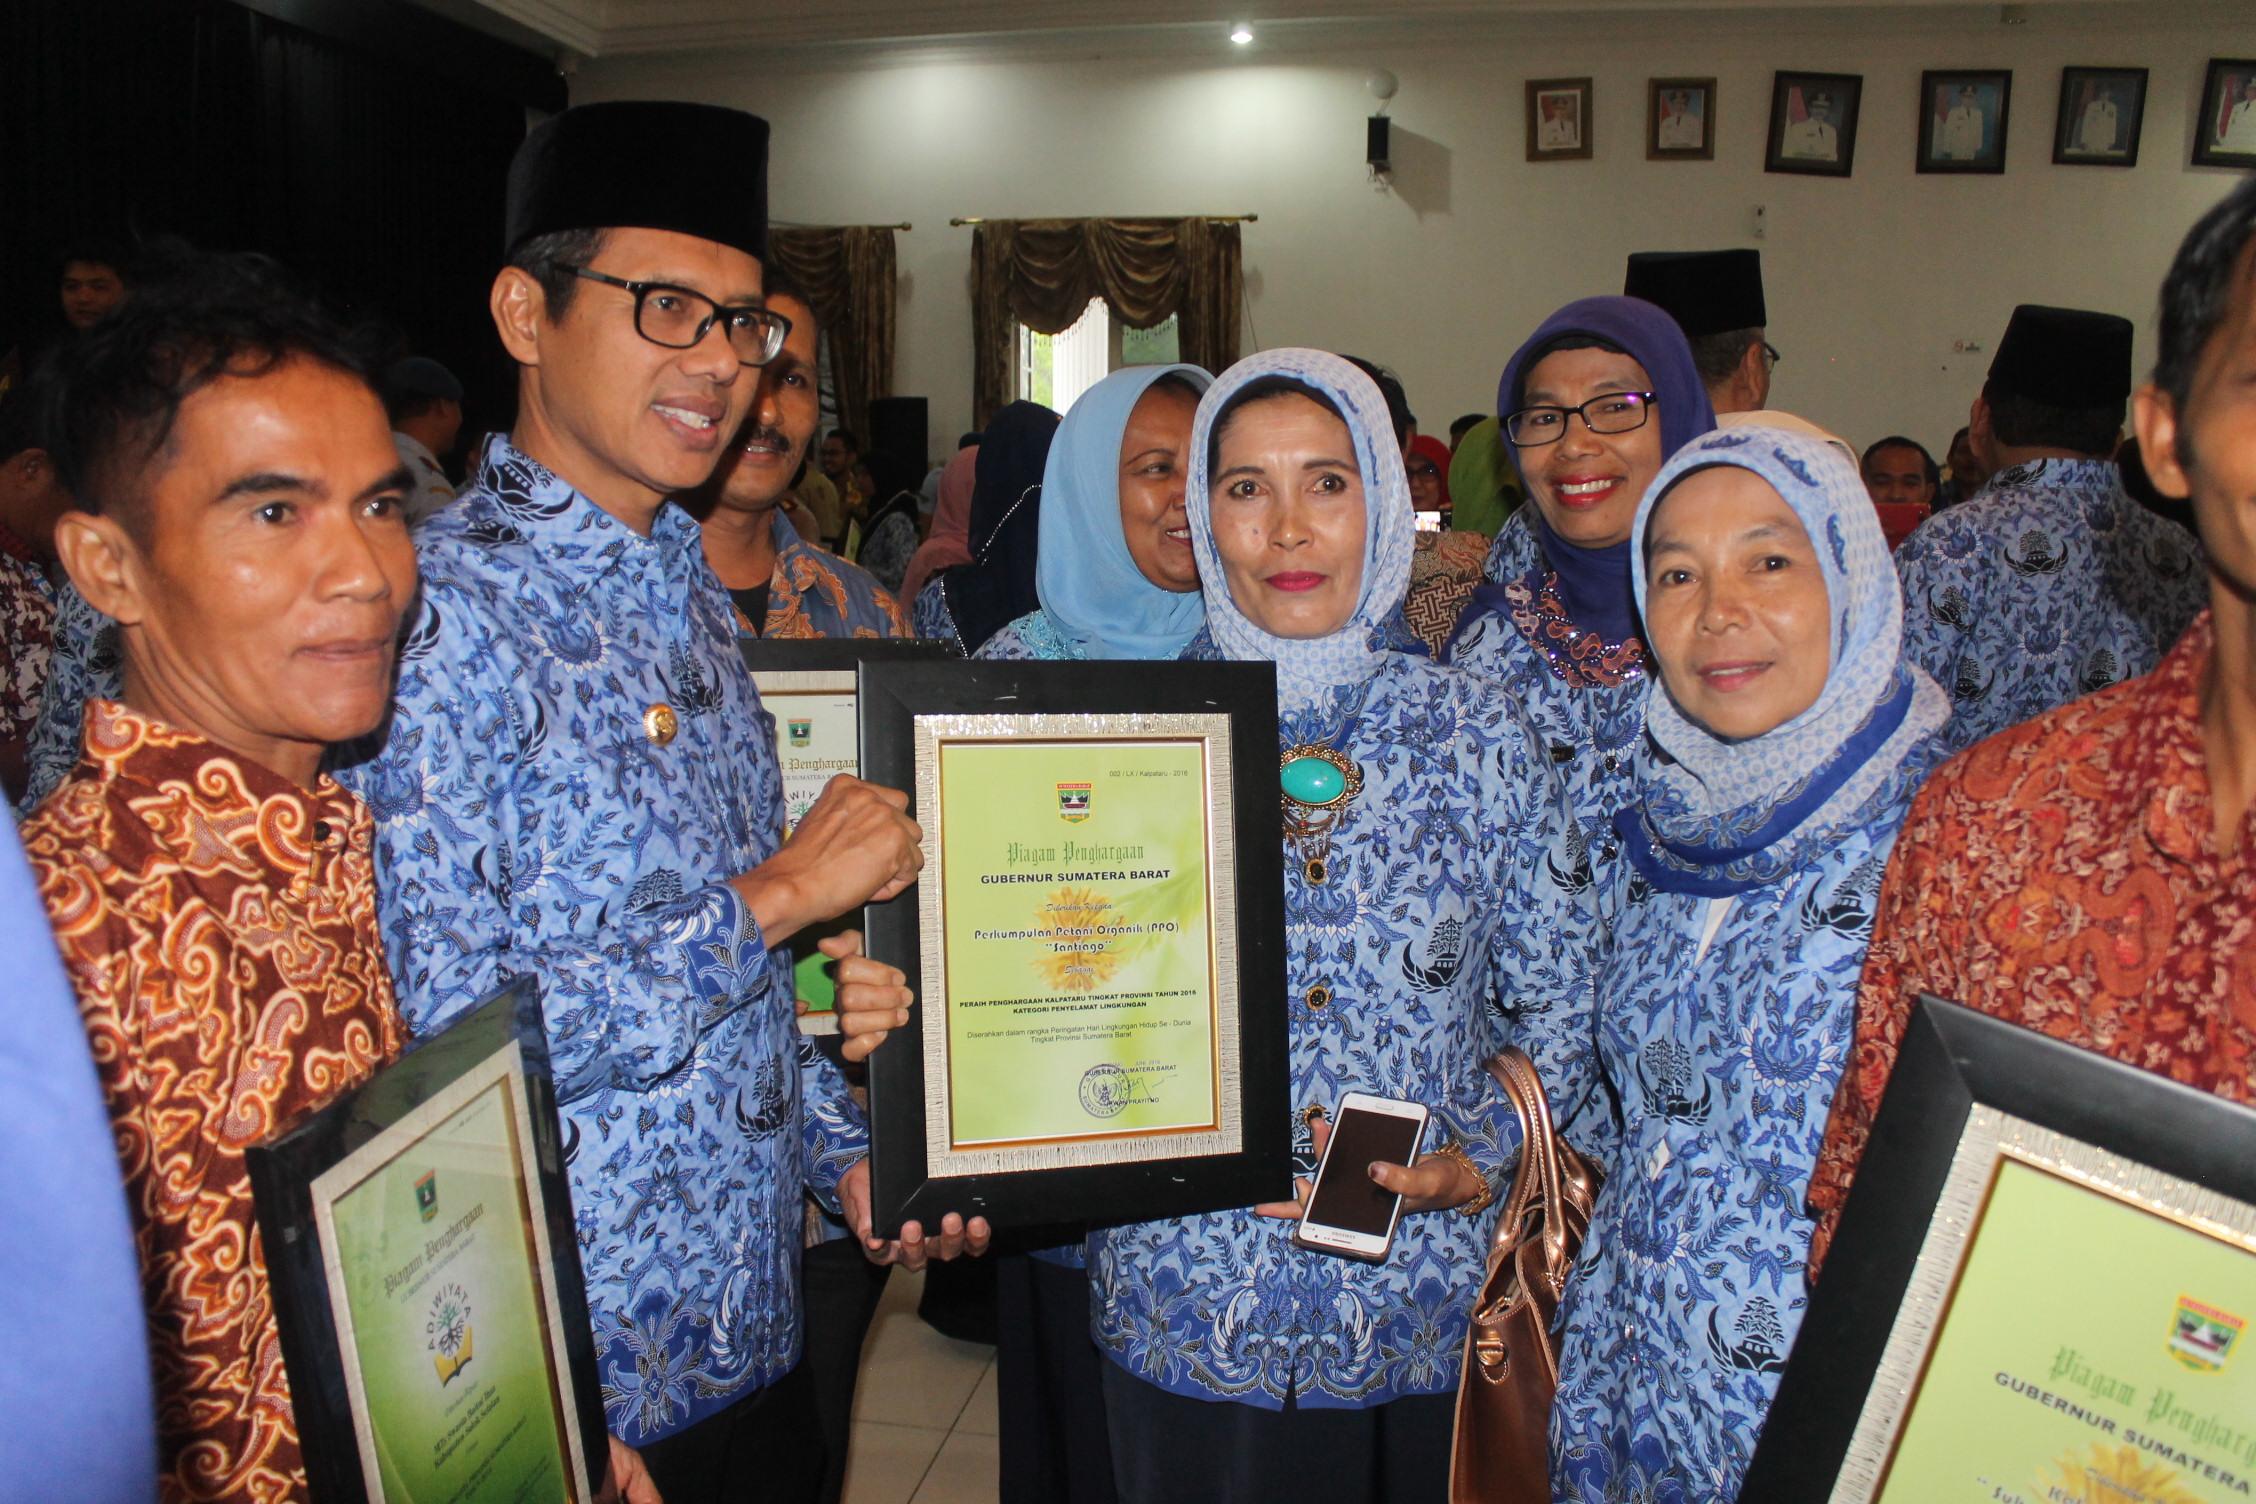 Pemenang Penghargaan Kalpataru Sumatera Barat Tahun 2016